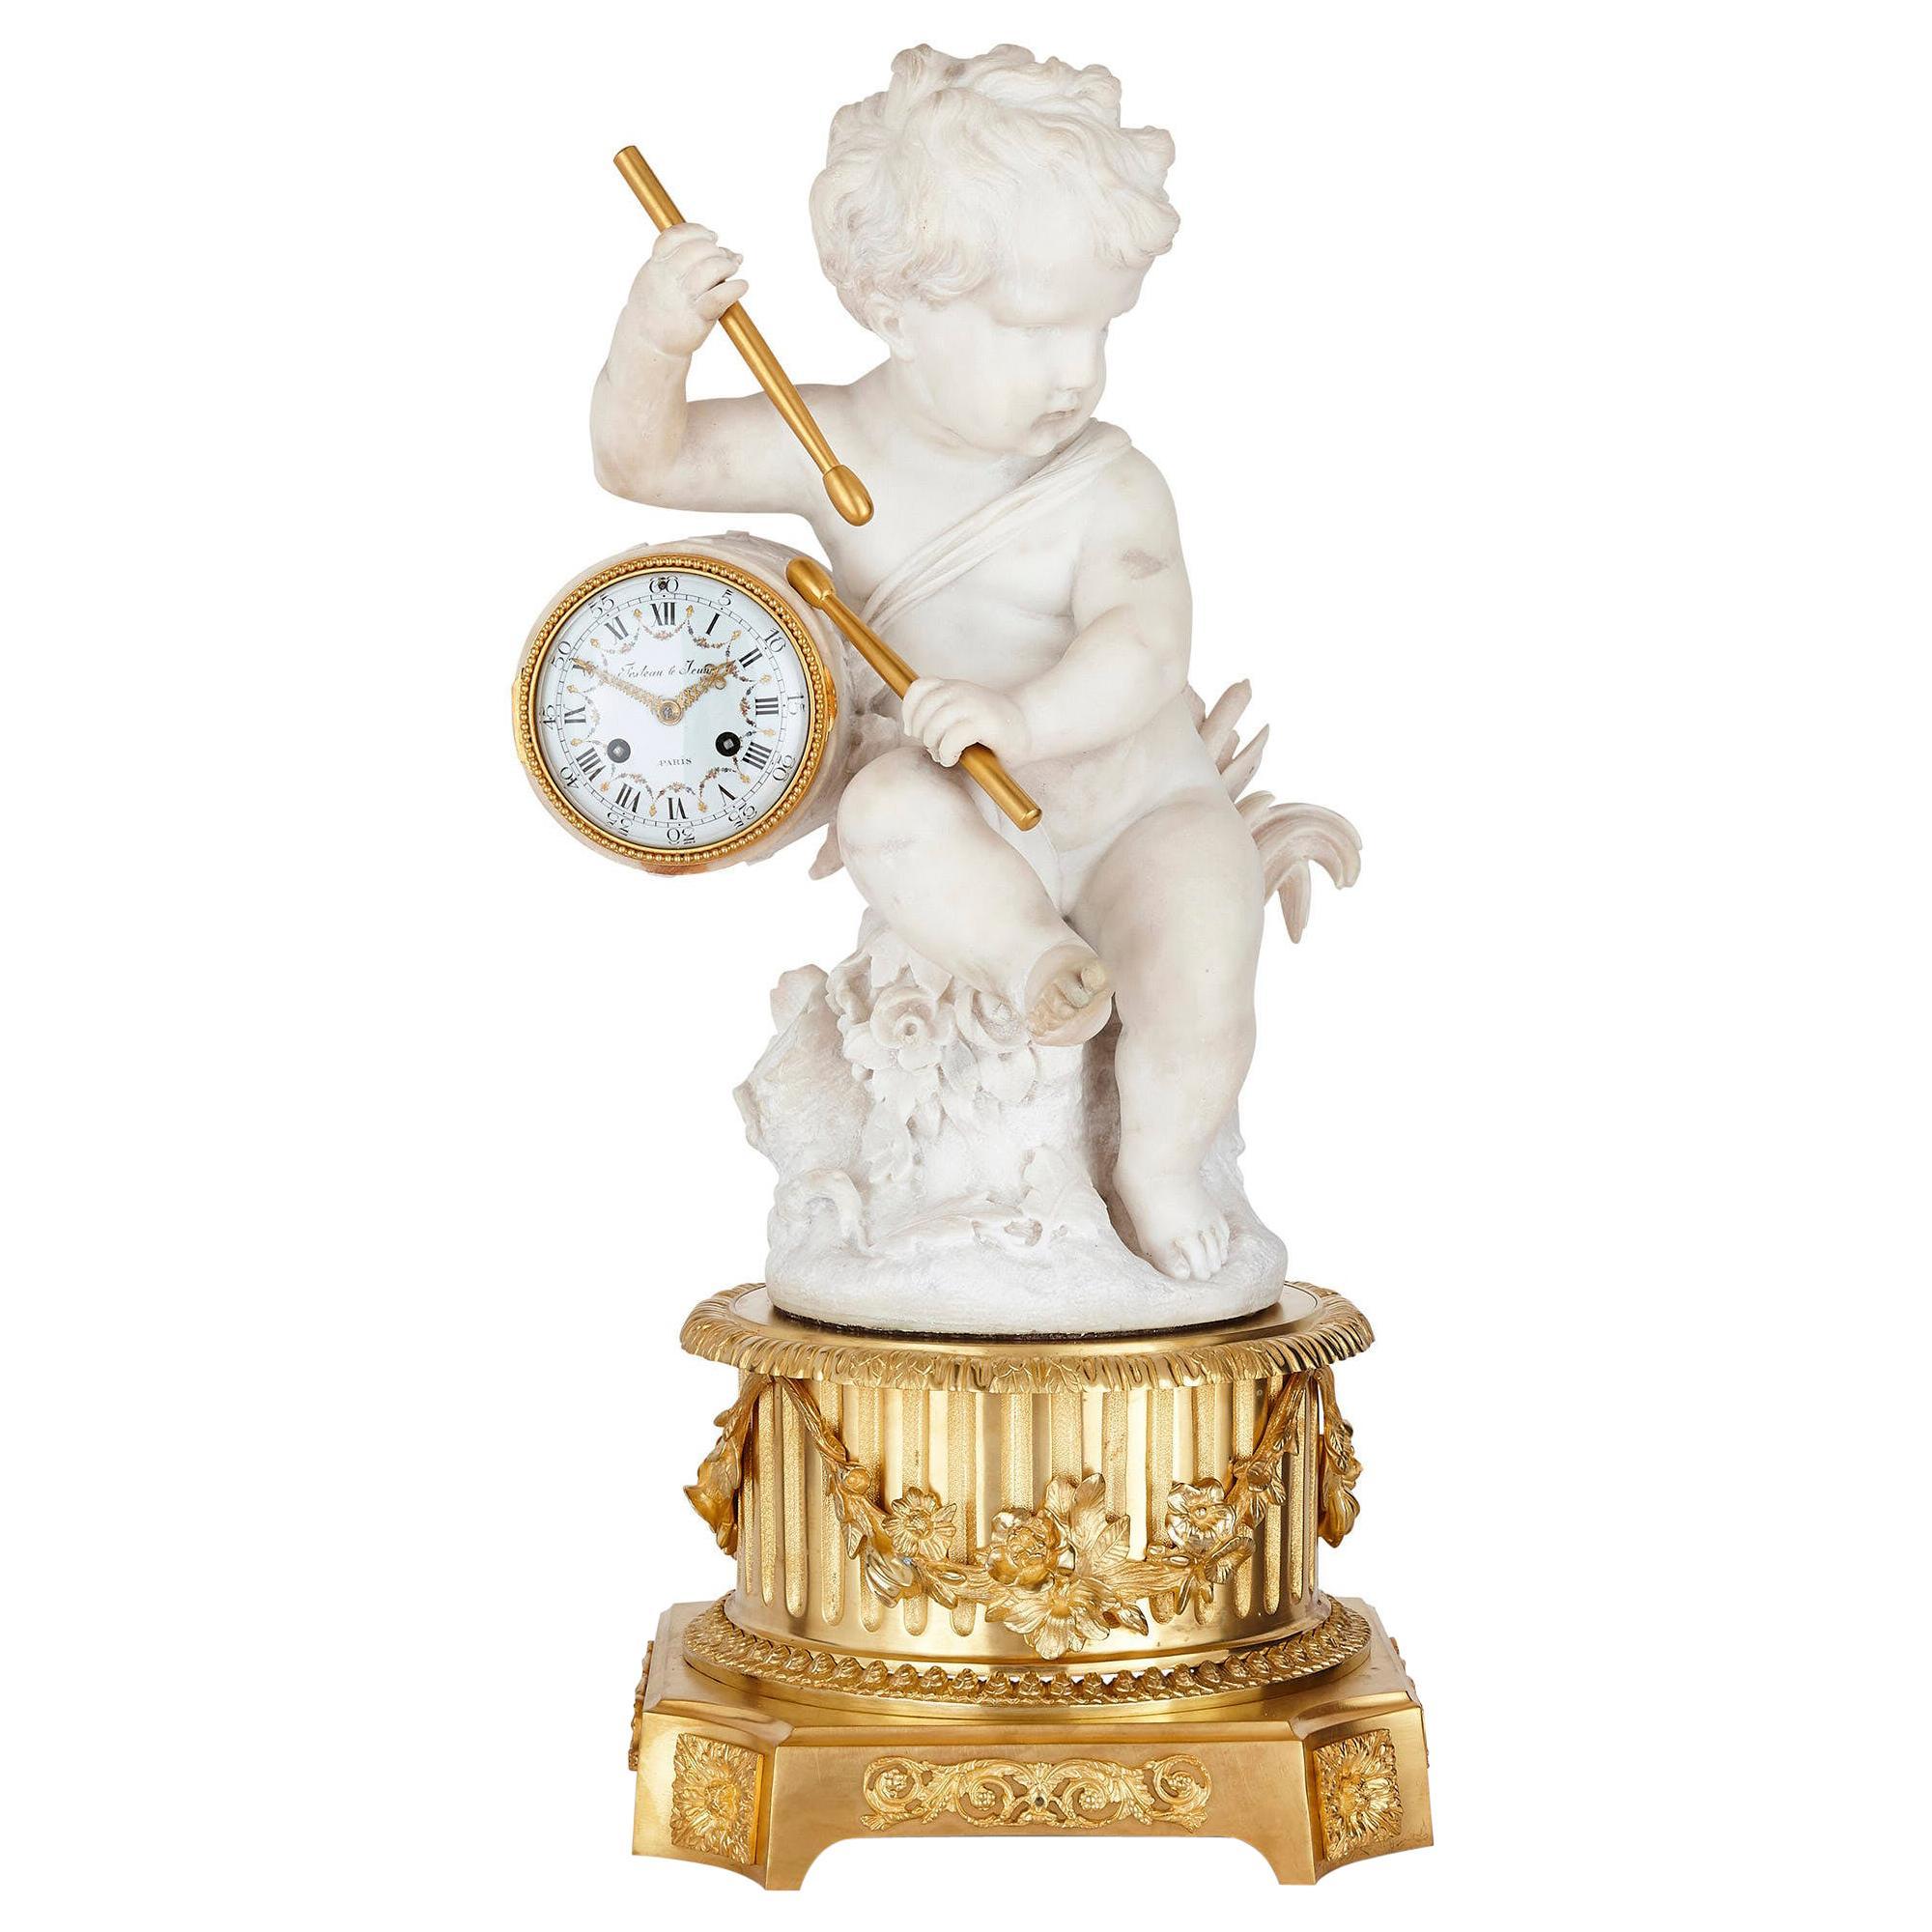 Gilt Bronze and Marble Cherub Mantel Clock by Raingo Frères